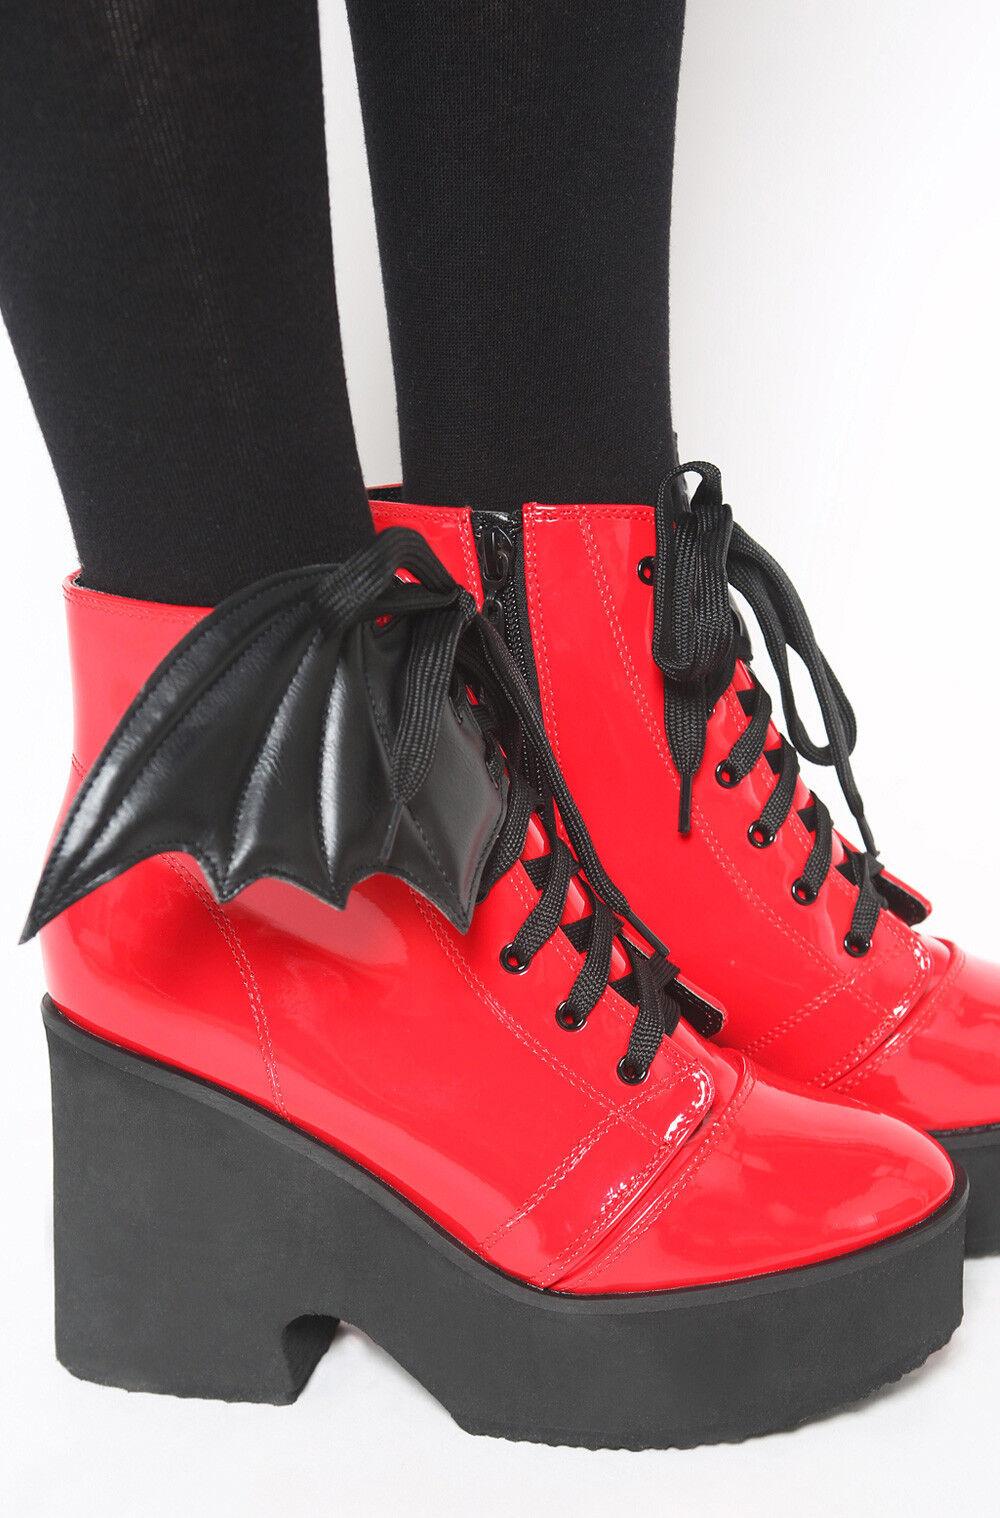 Iron Fist Bat Wing Boot Red Patent Shoes Platform Goth Punk Sexy Dark Heels